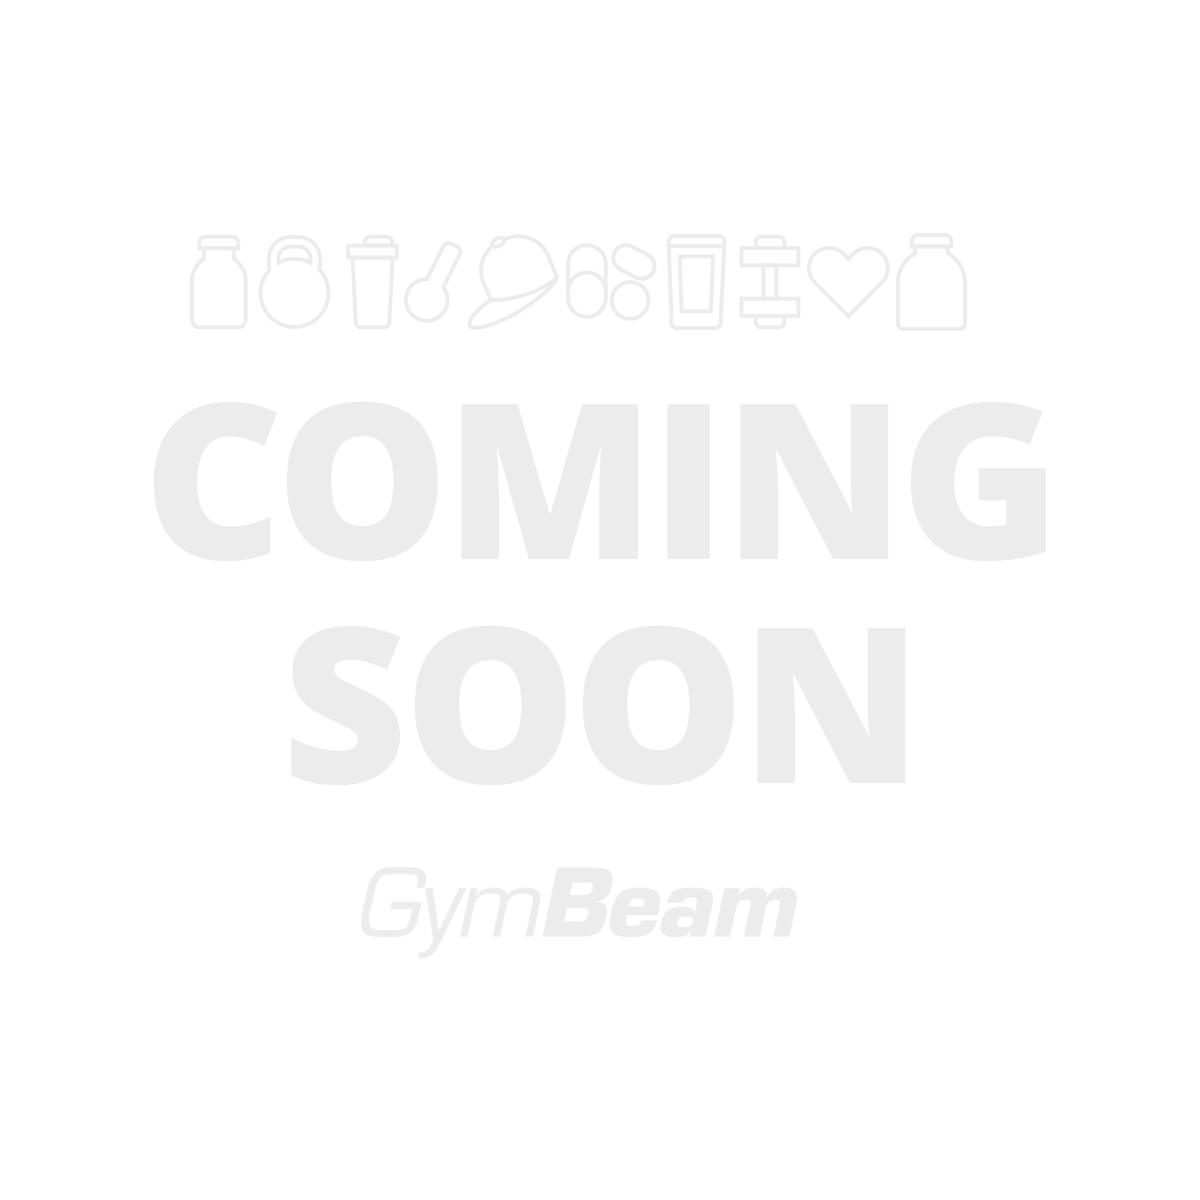 Creatina Creactor 220 g - MuscleTech